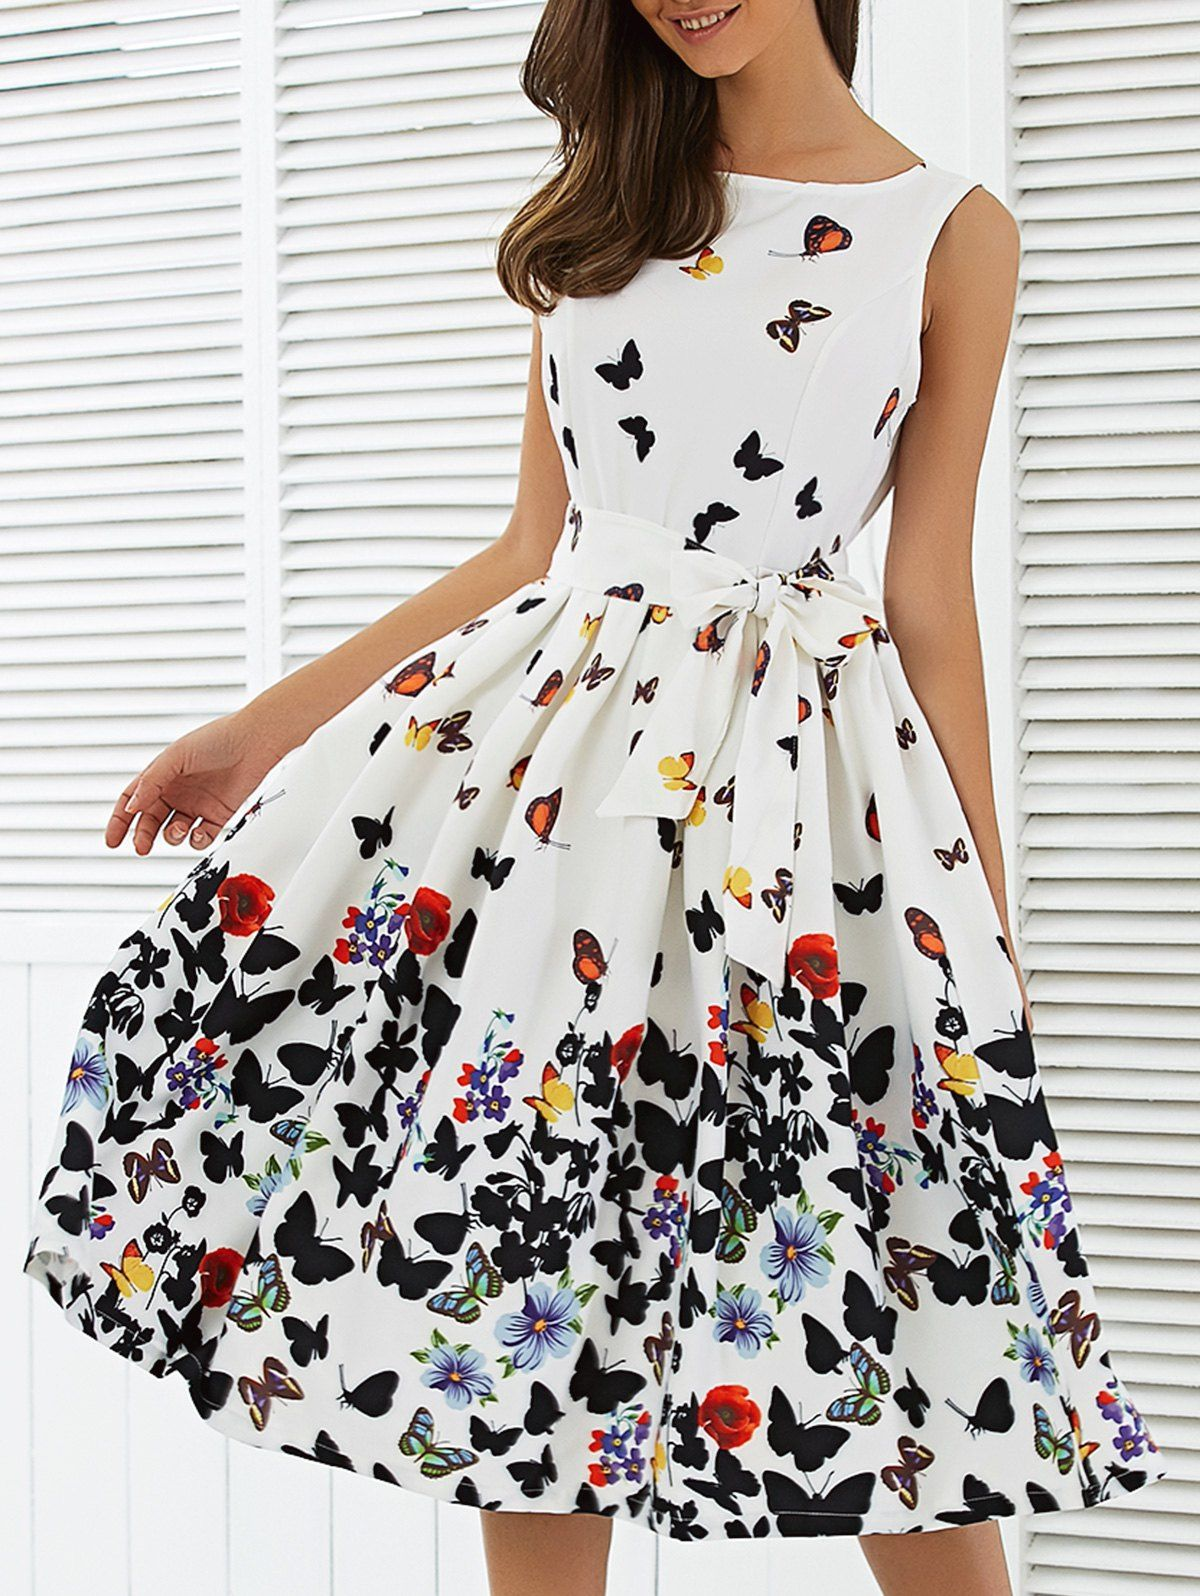 Print dress images